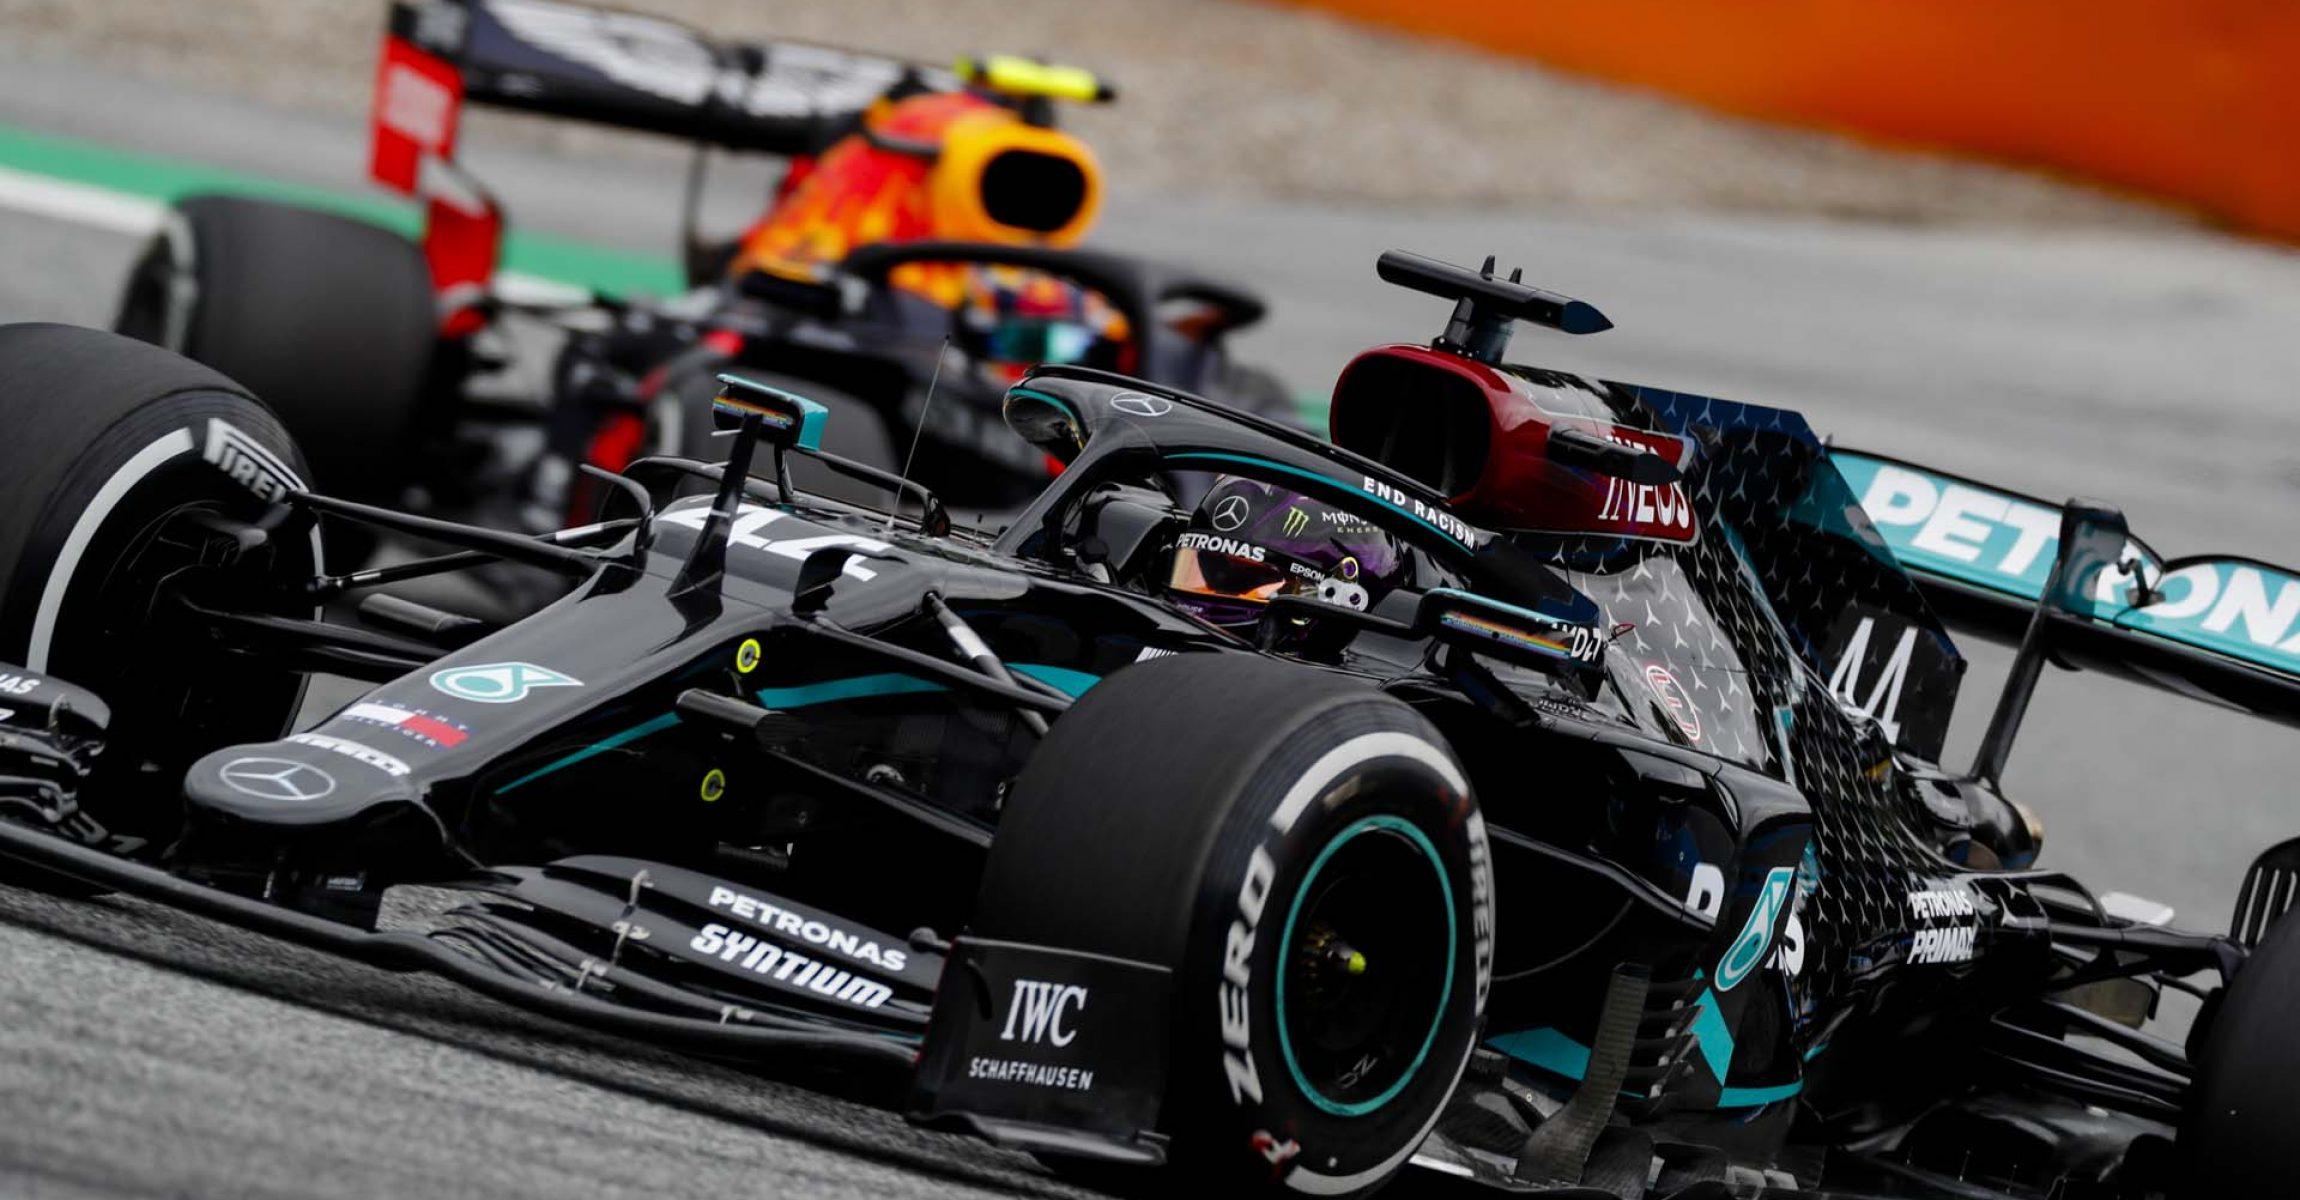 2020 Austrian Grand Prix, Friday - LAT Images Lewis Hamilton Mercedes followed by Alexander Albon Red Bull